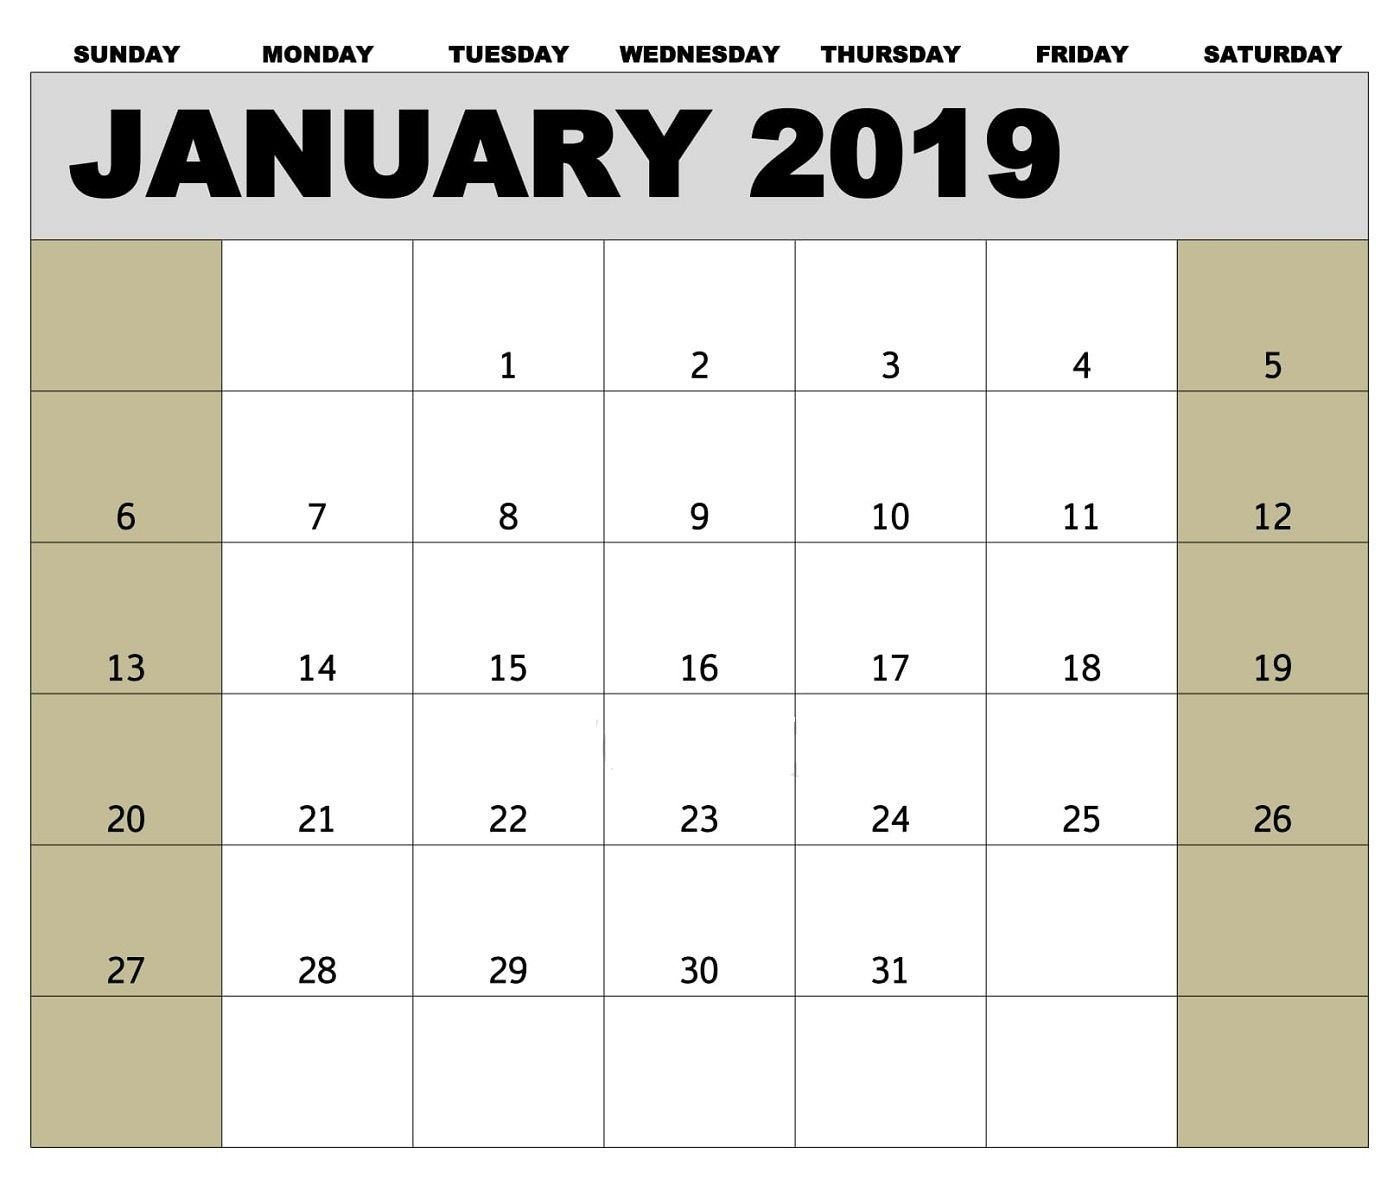 January 2019 Biweekly Payroll Calendar Template For-Template For Semi Monthly Payroll Calendar 2020